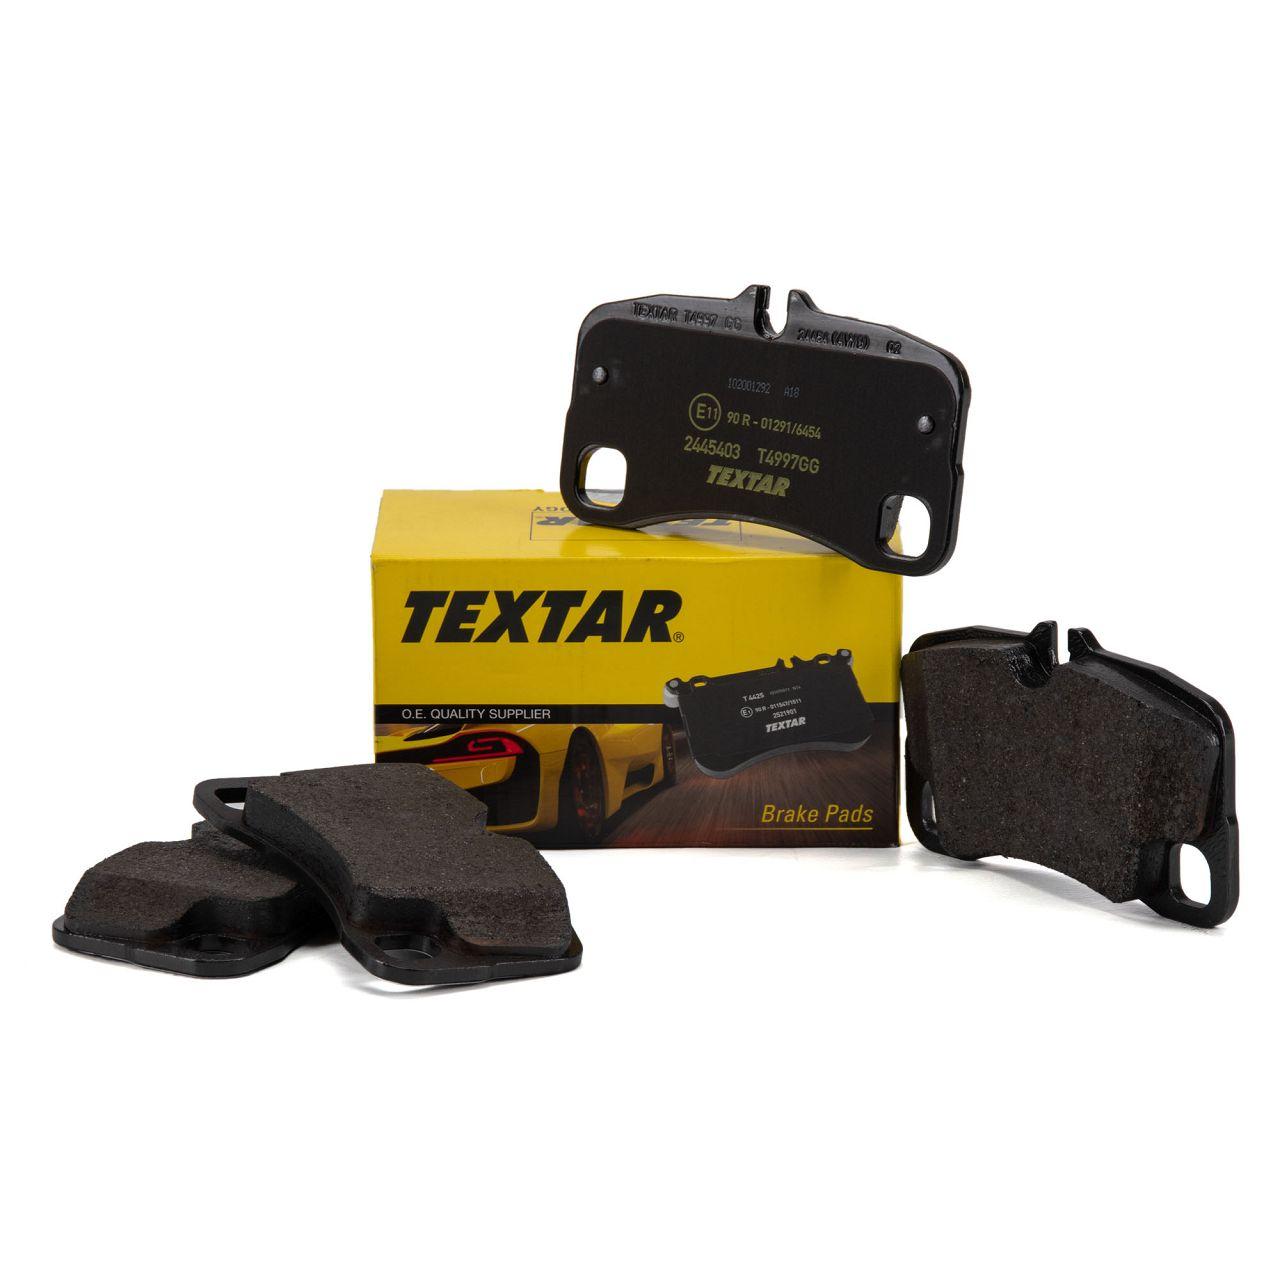 TEXTAR 2445403 Bremsbeläge PORSCHE 997 3.6/3.8 Turbo / S hinten 99735294905